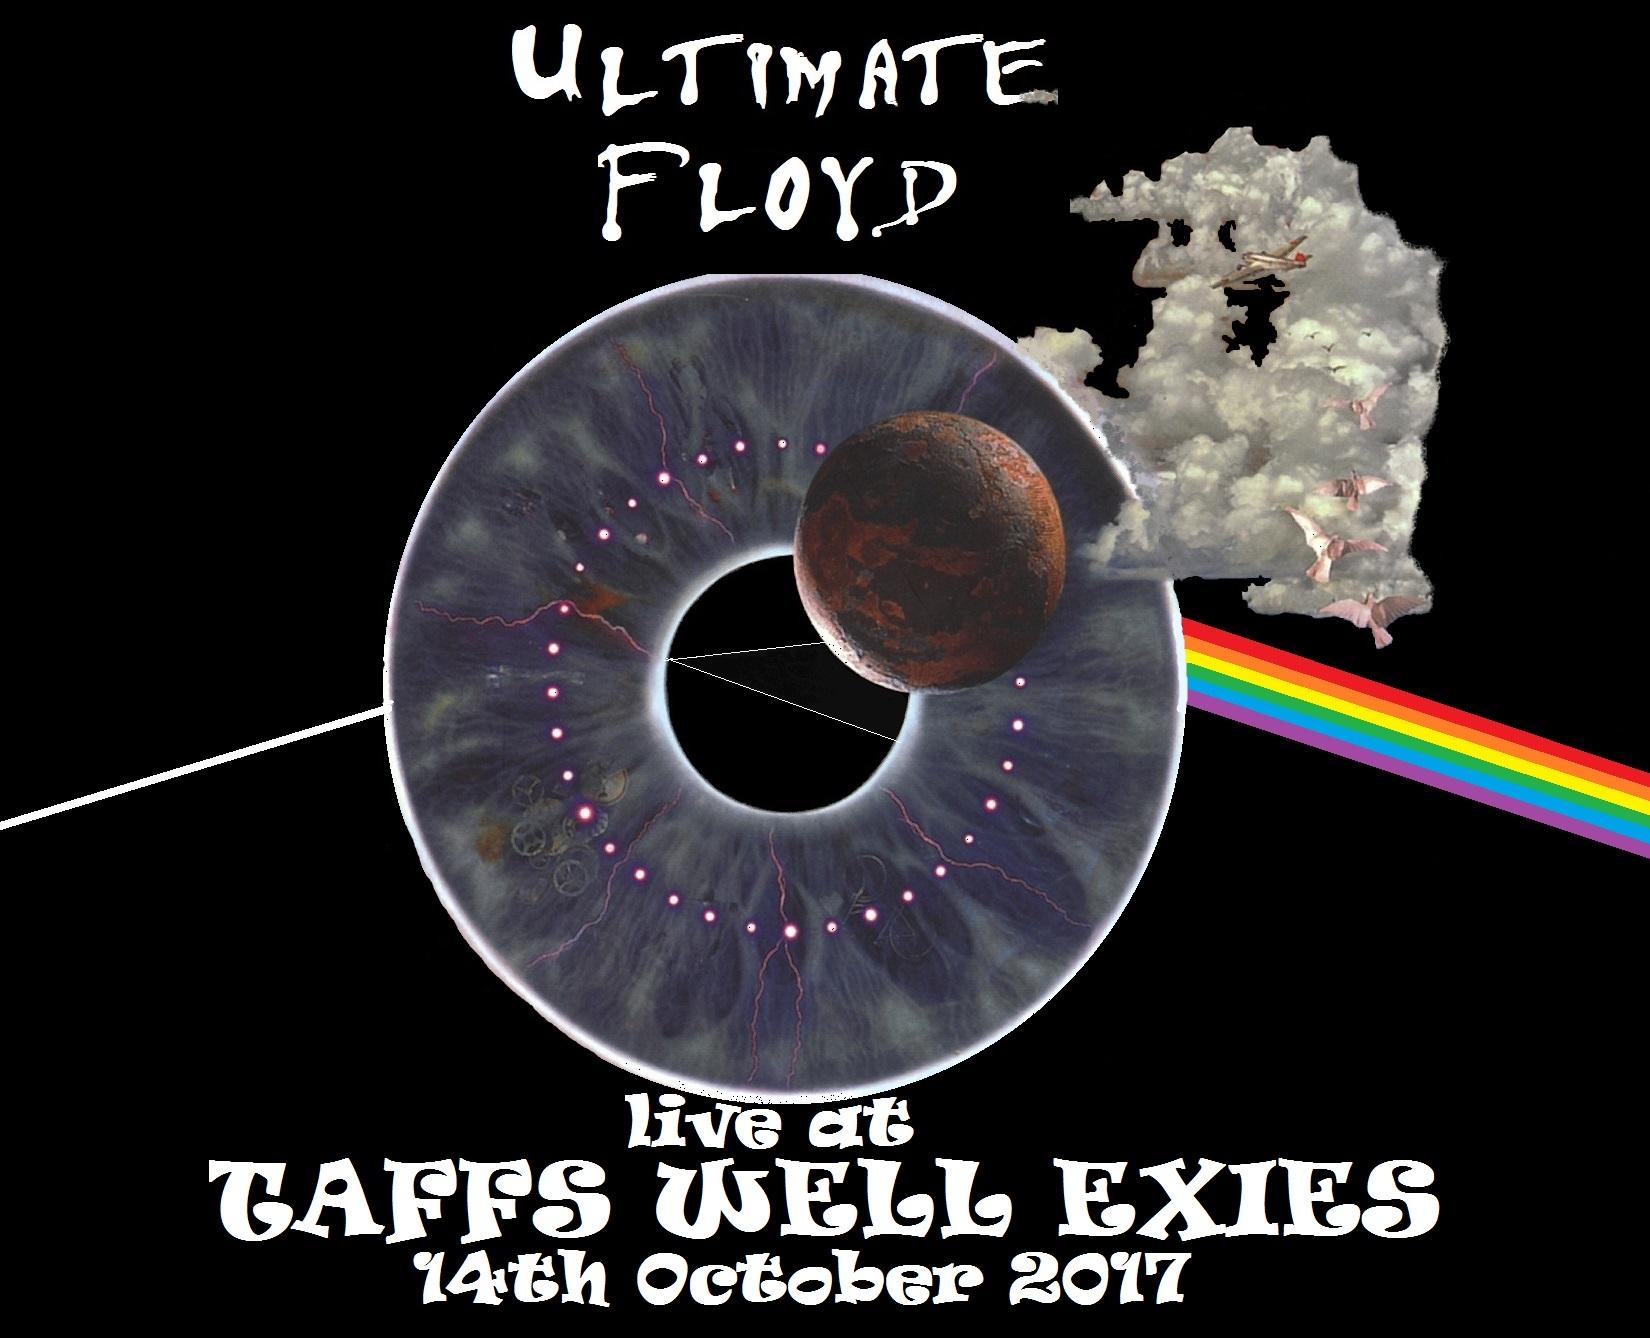 ultimate-floyd-taffs-well-exies-14-10-2017